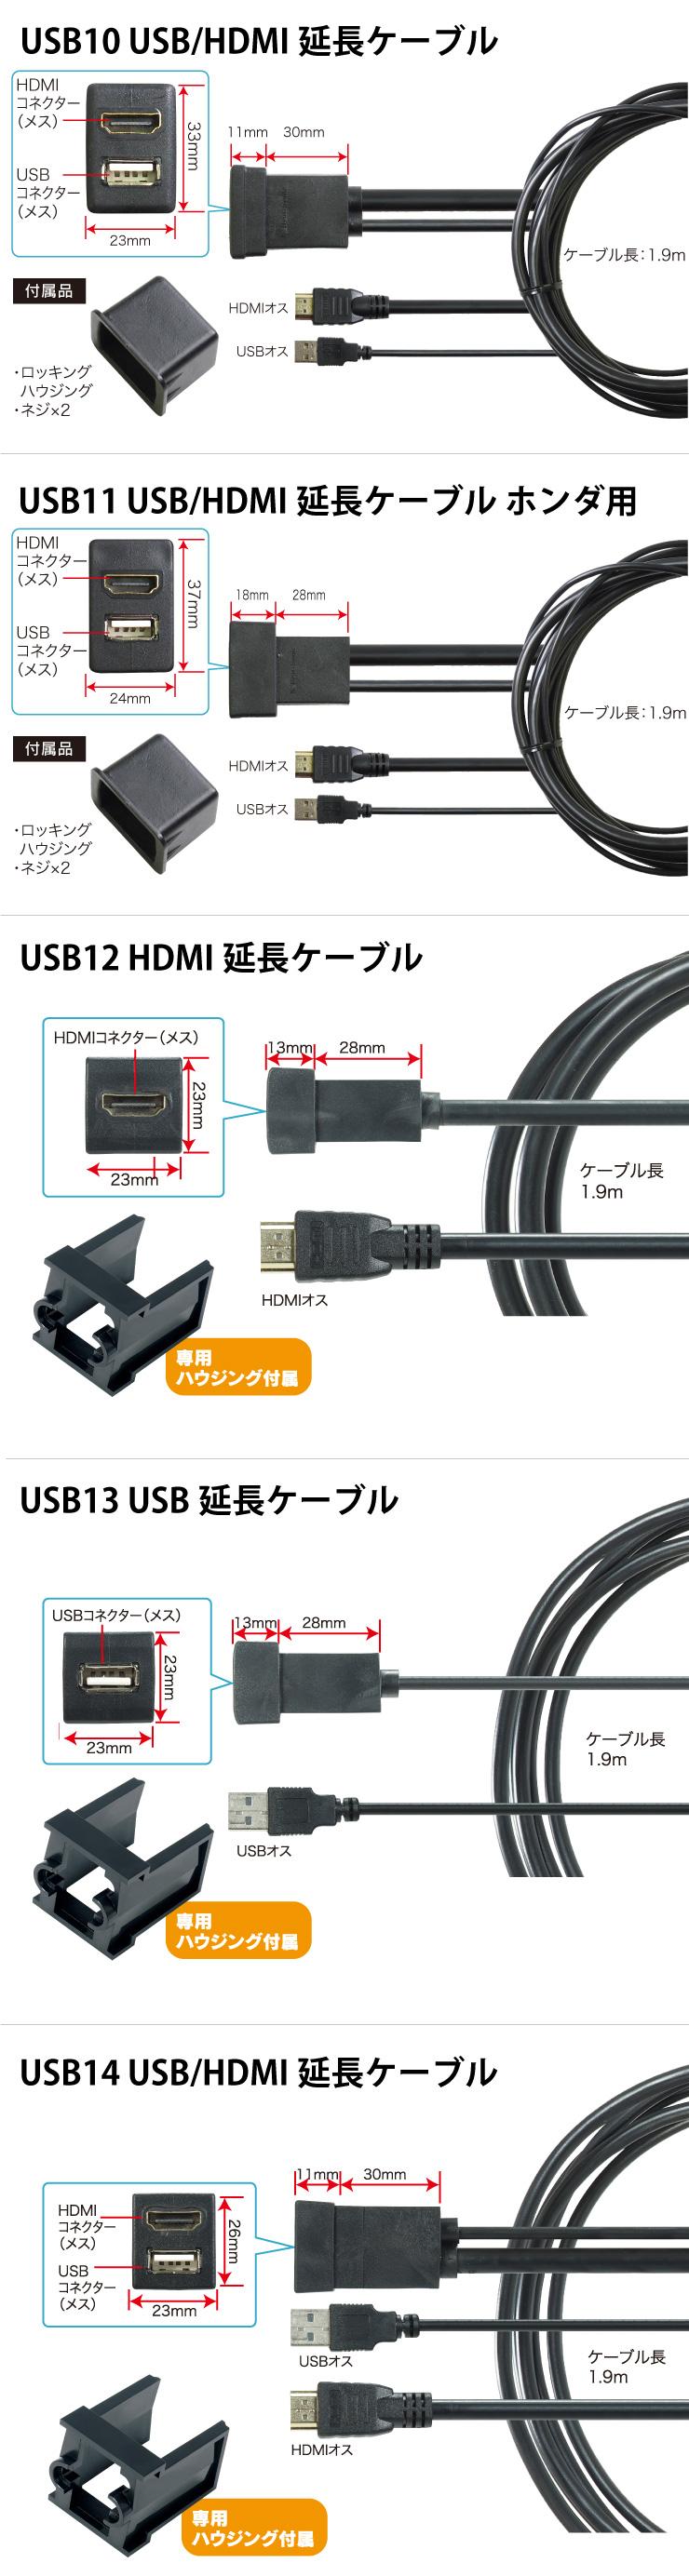 USB10/11